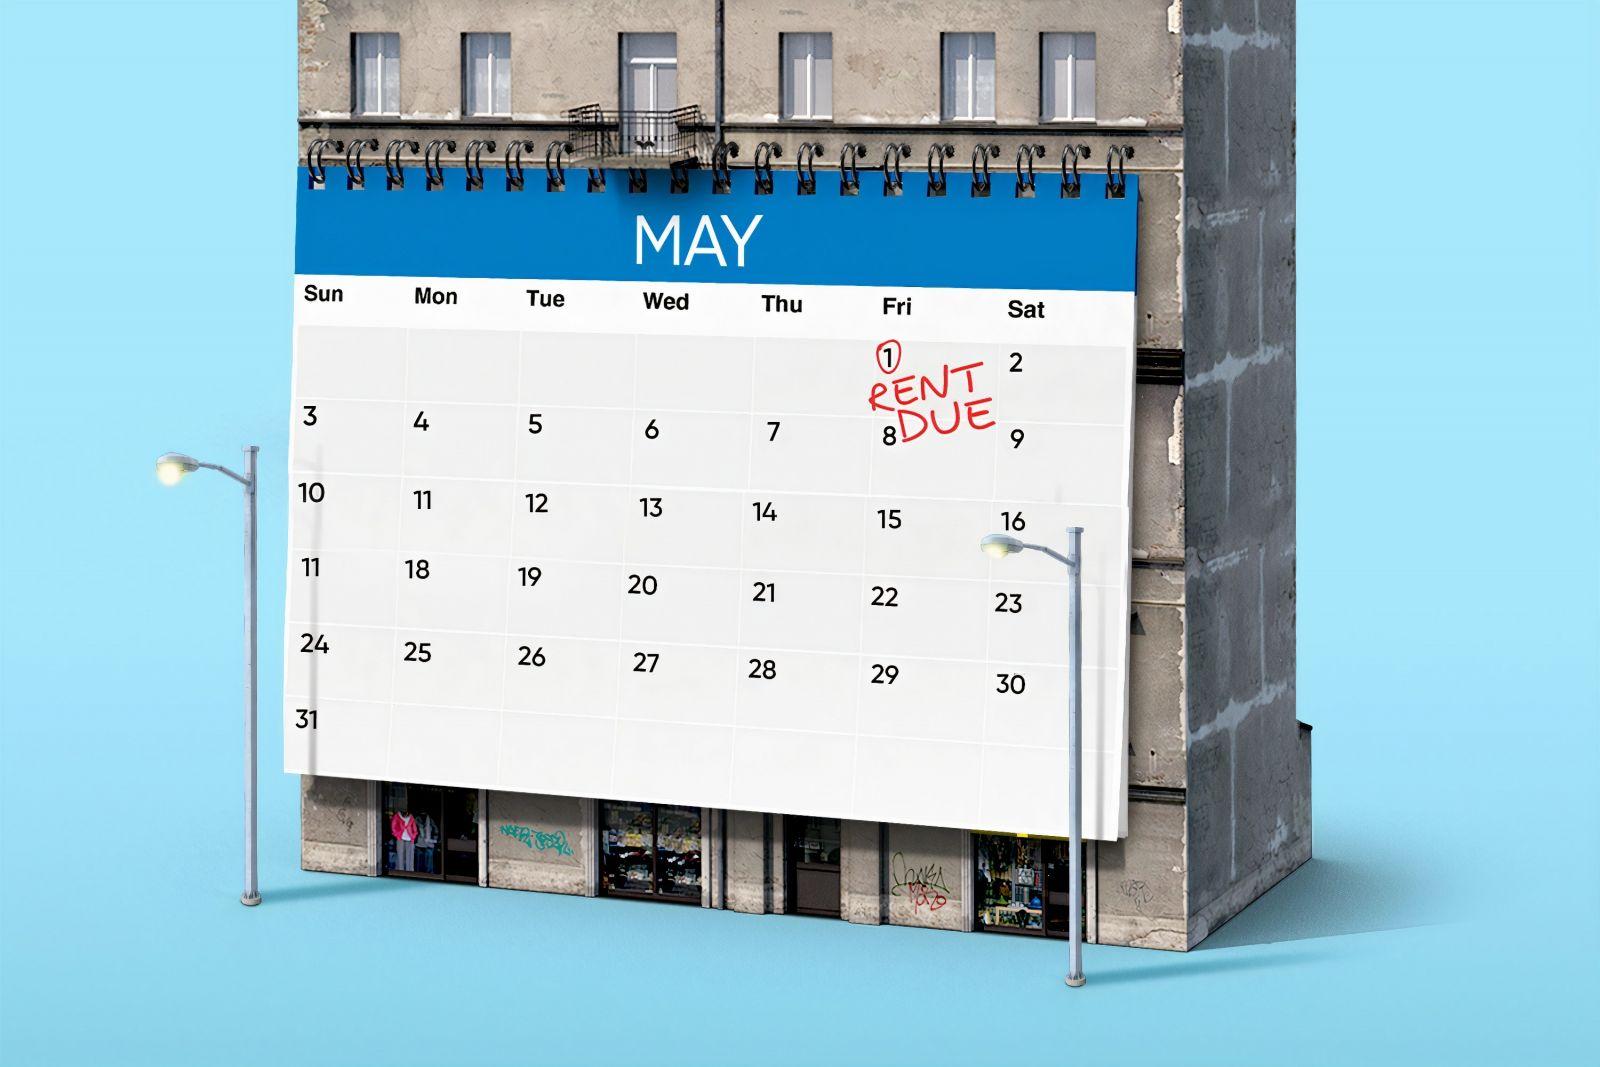 Rent Due Calendar banner image